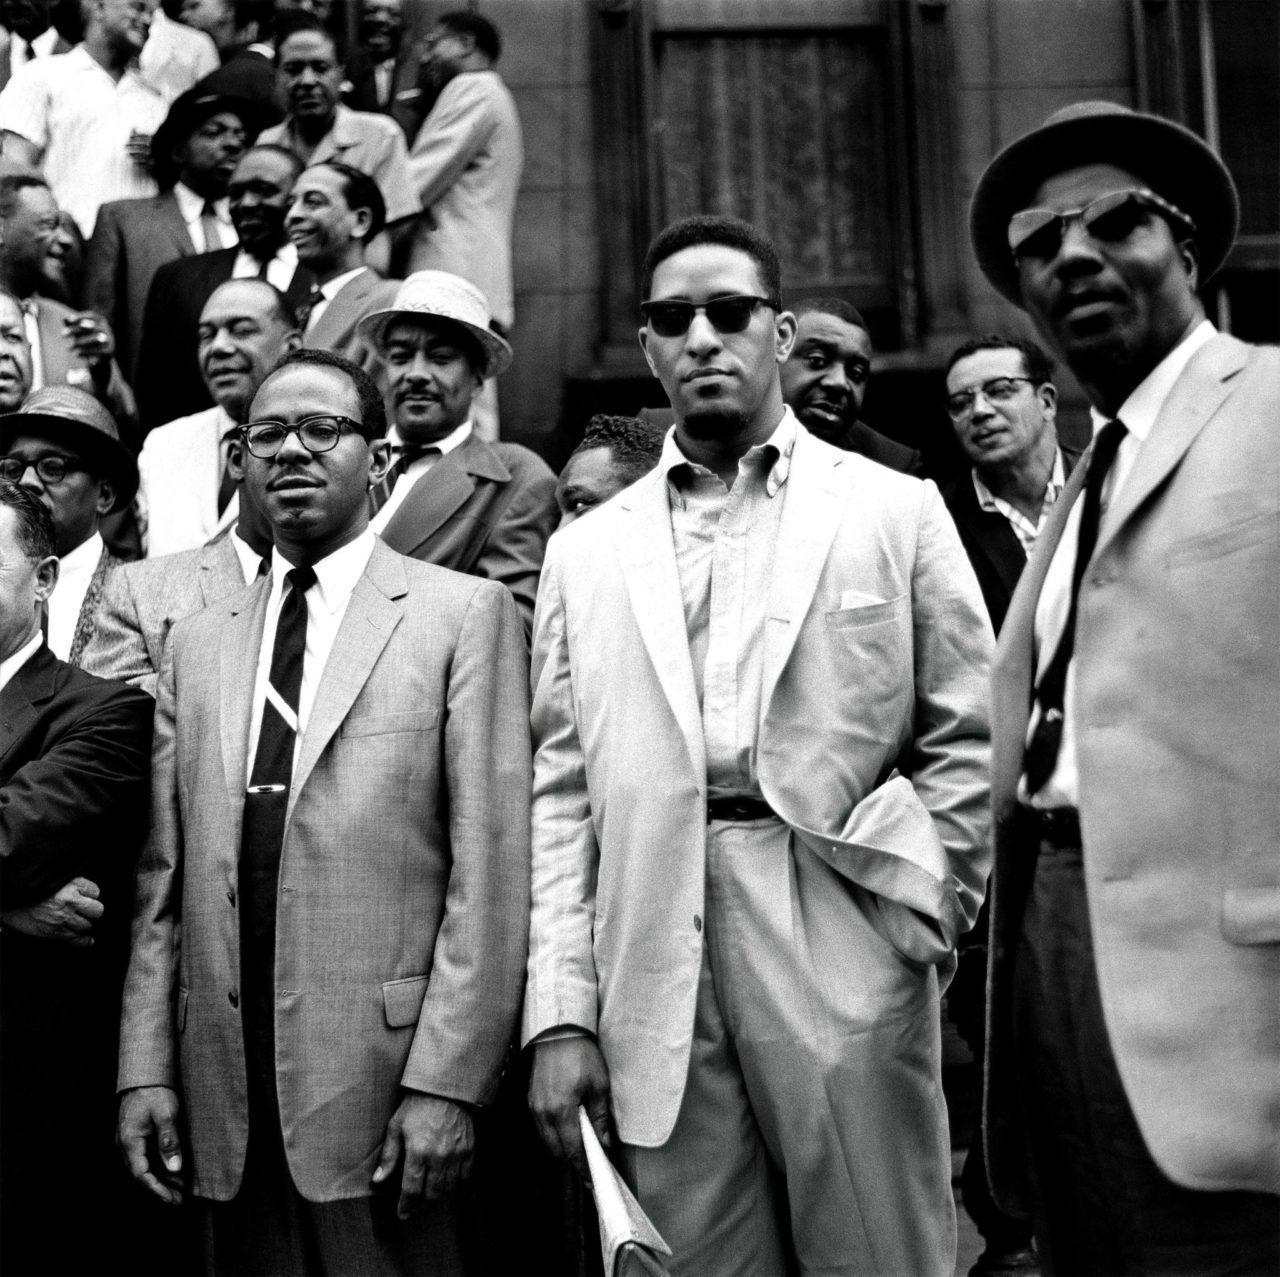 Harlem 1958 Behind The Scenes Of The Legendary Jazz